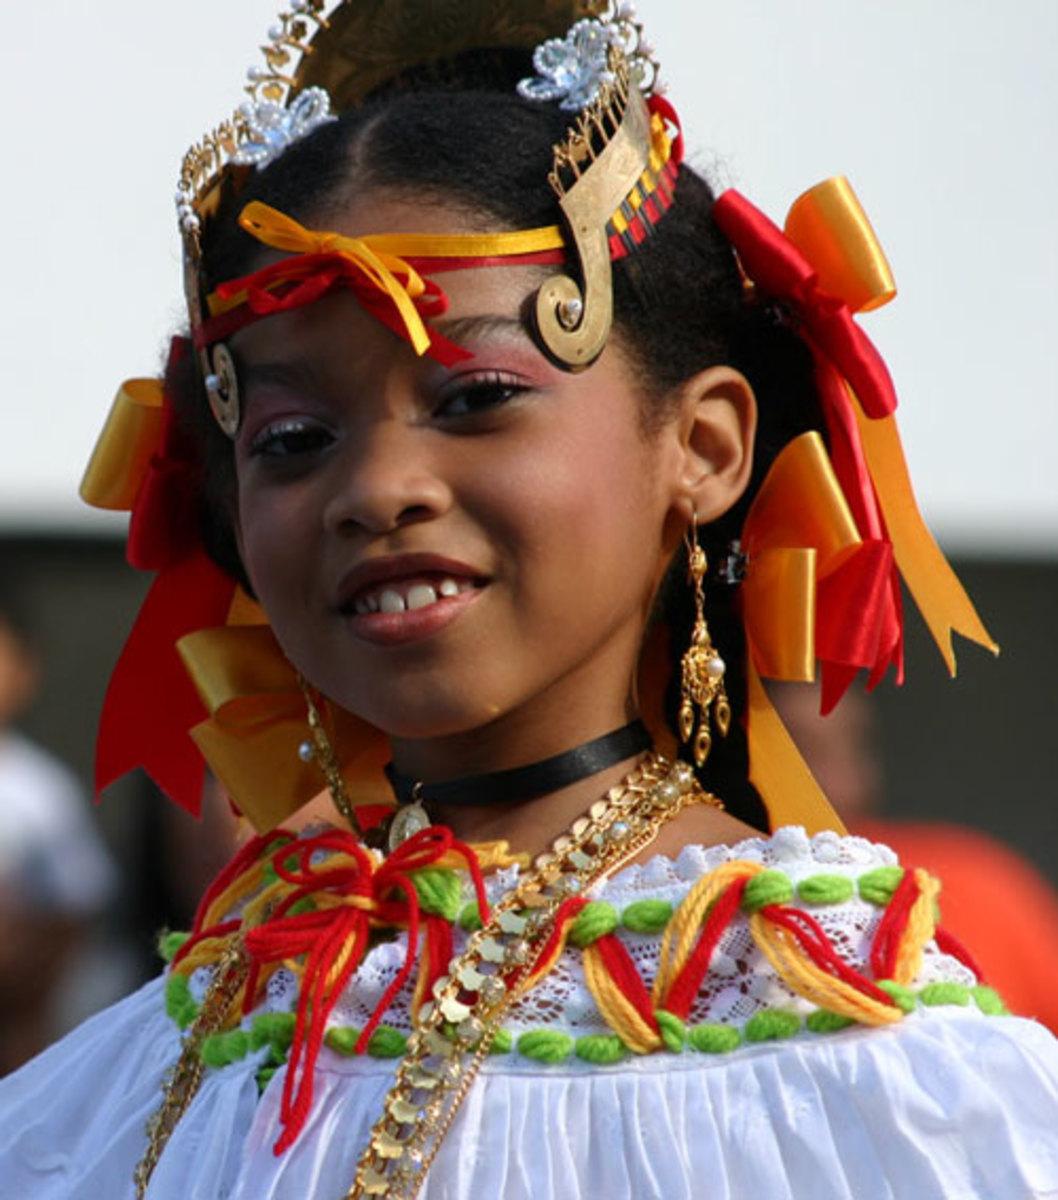 Panama Tradtional Dance Costume